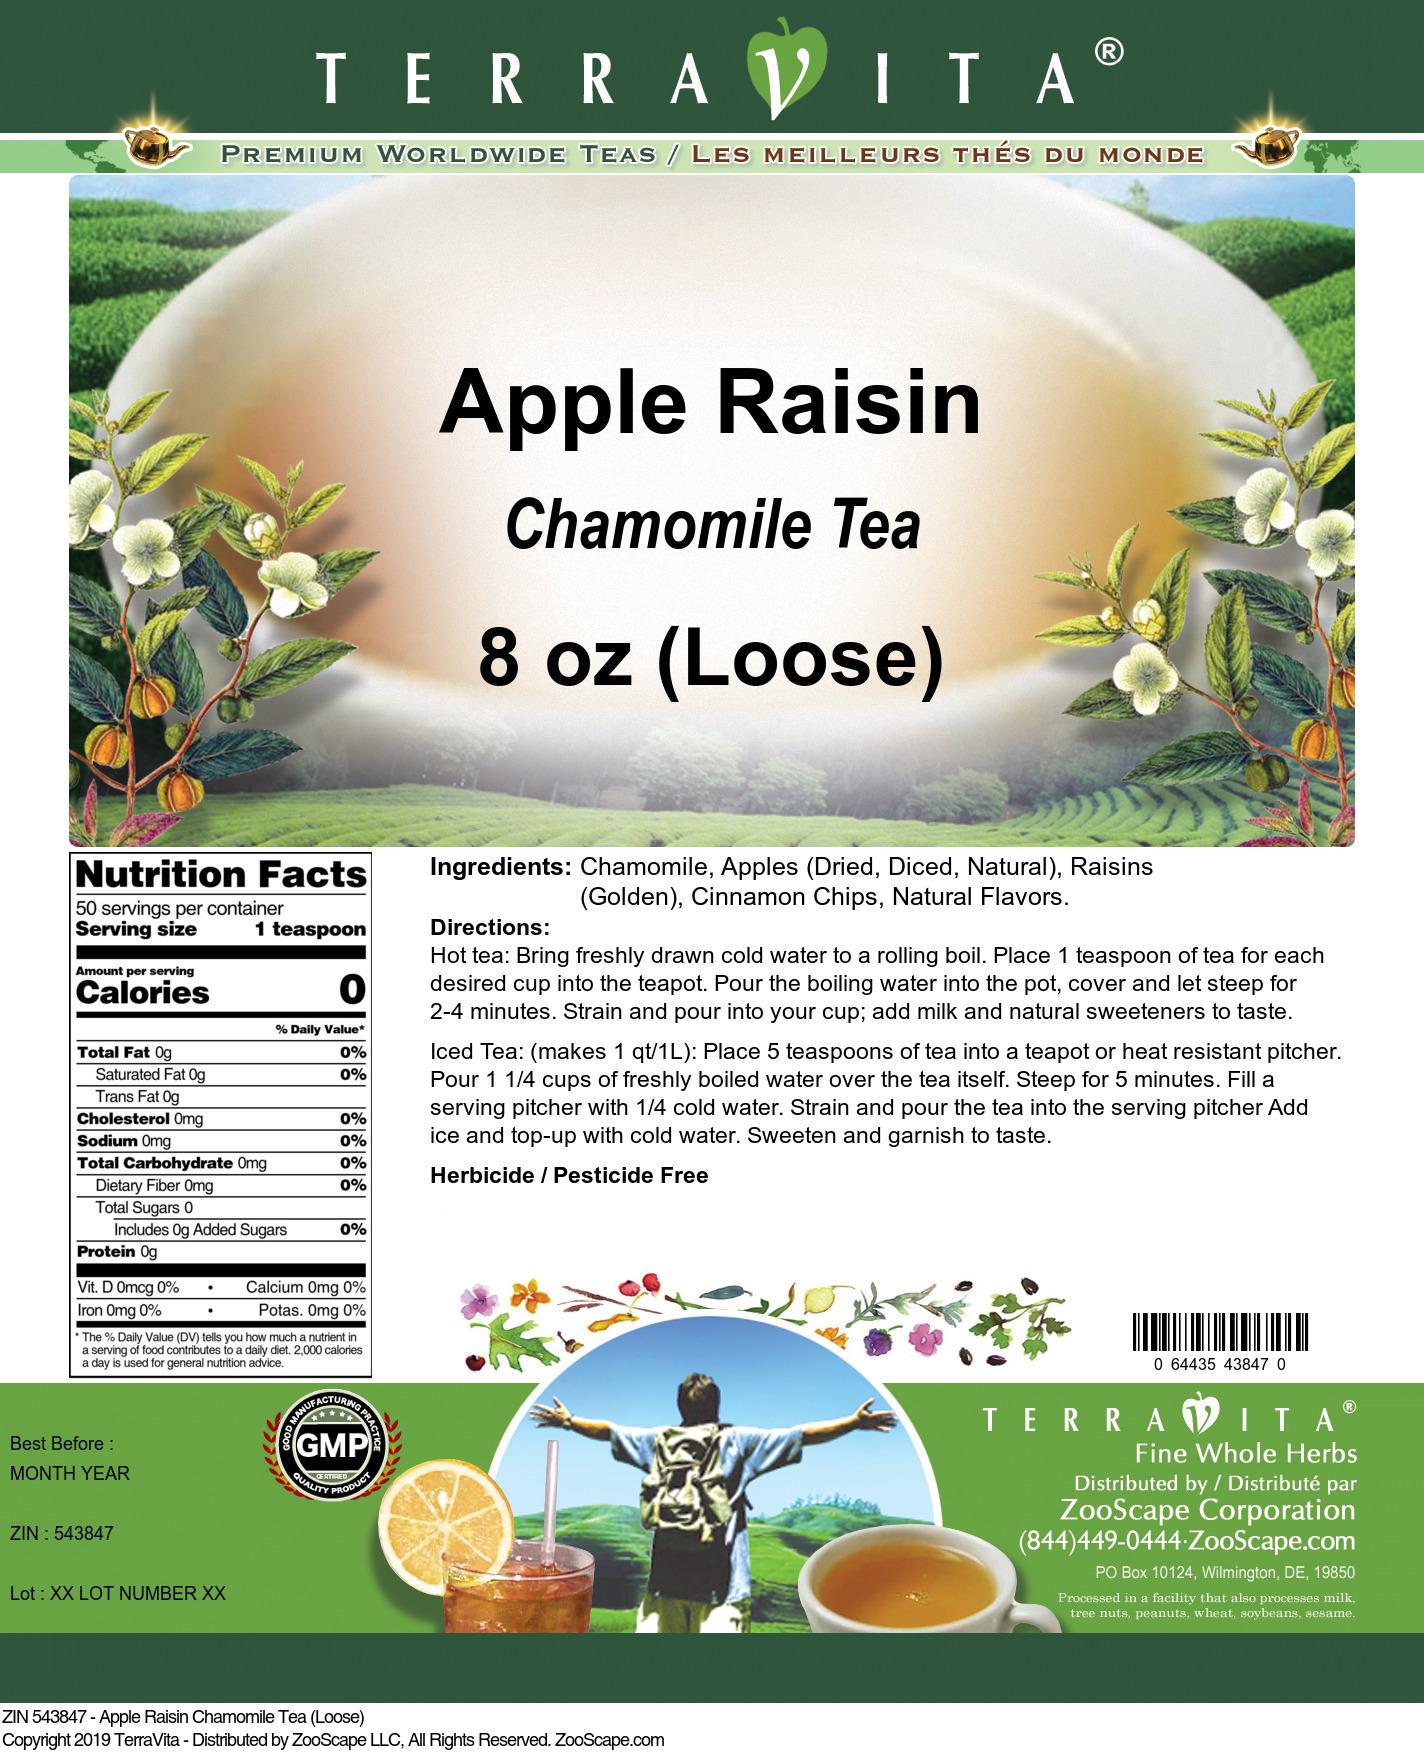 Apple Raisin Chamomile Tea